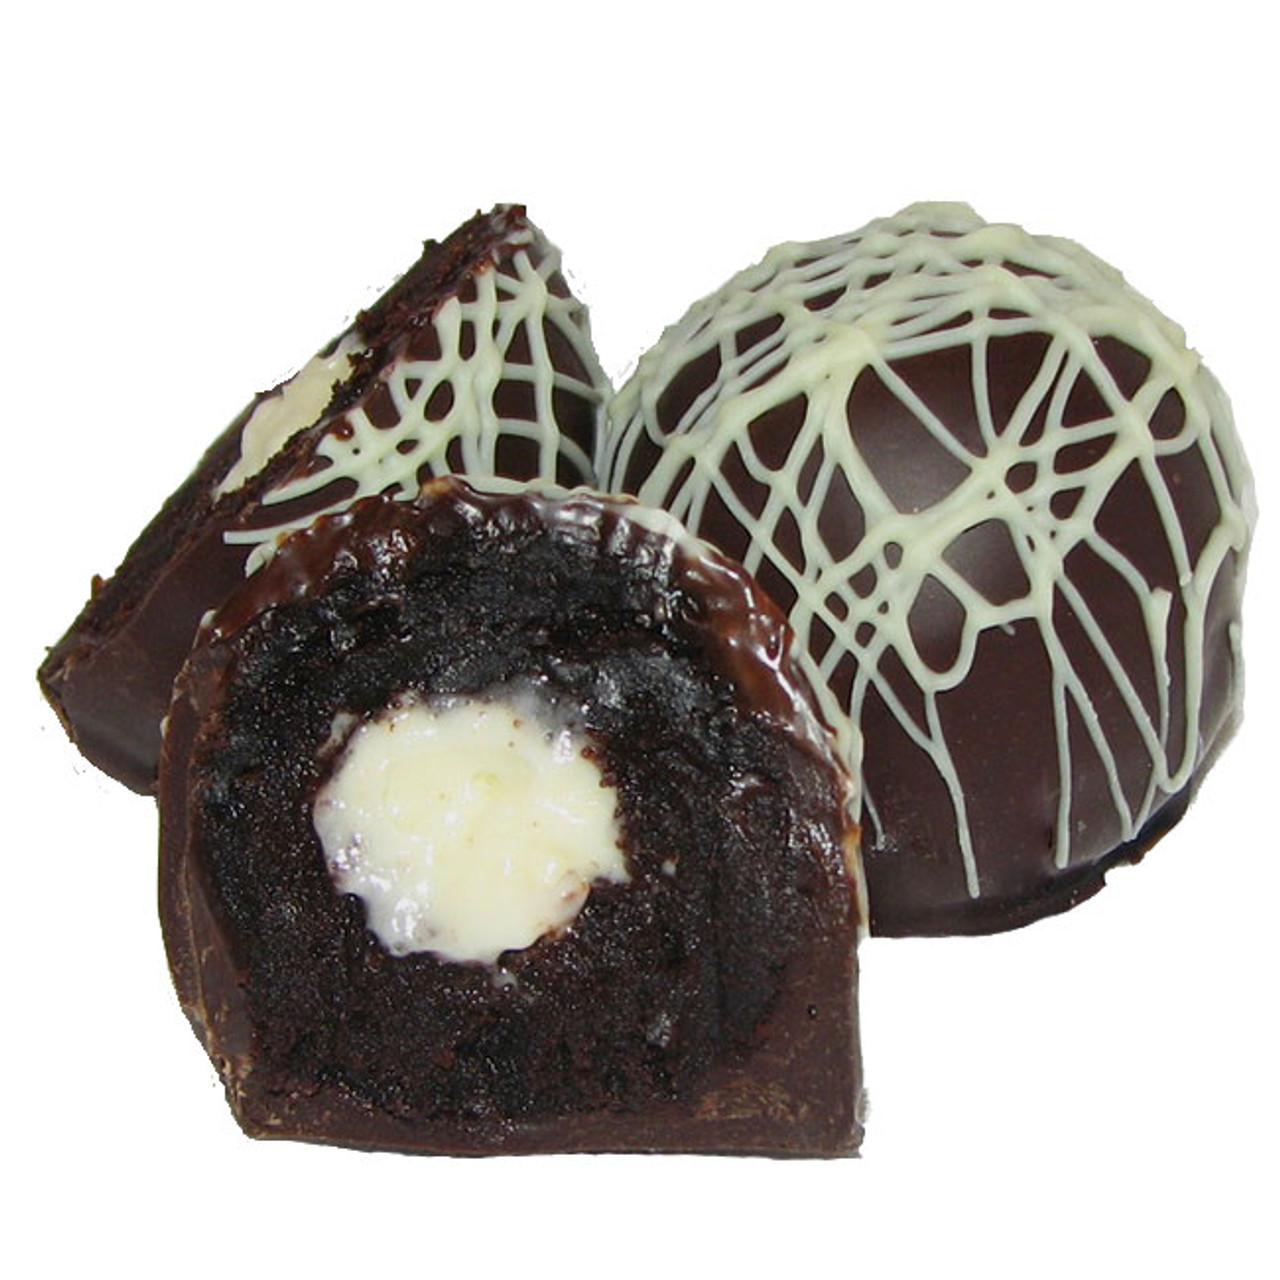 Birthday Cake Dessert Truffle Gabriella Chocolates Confections